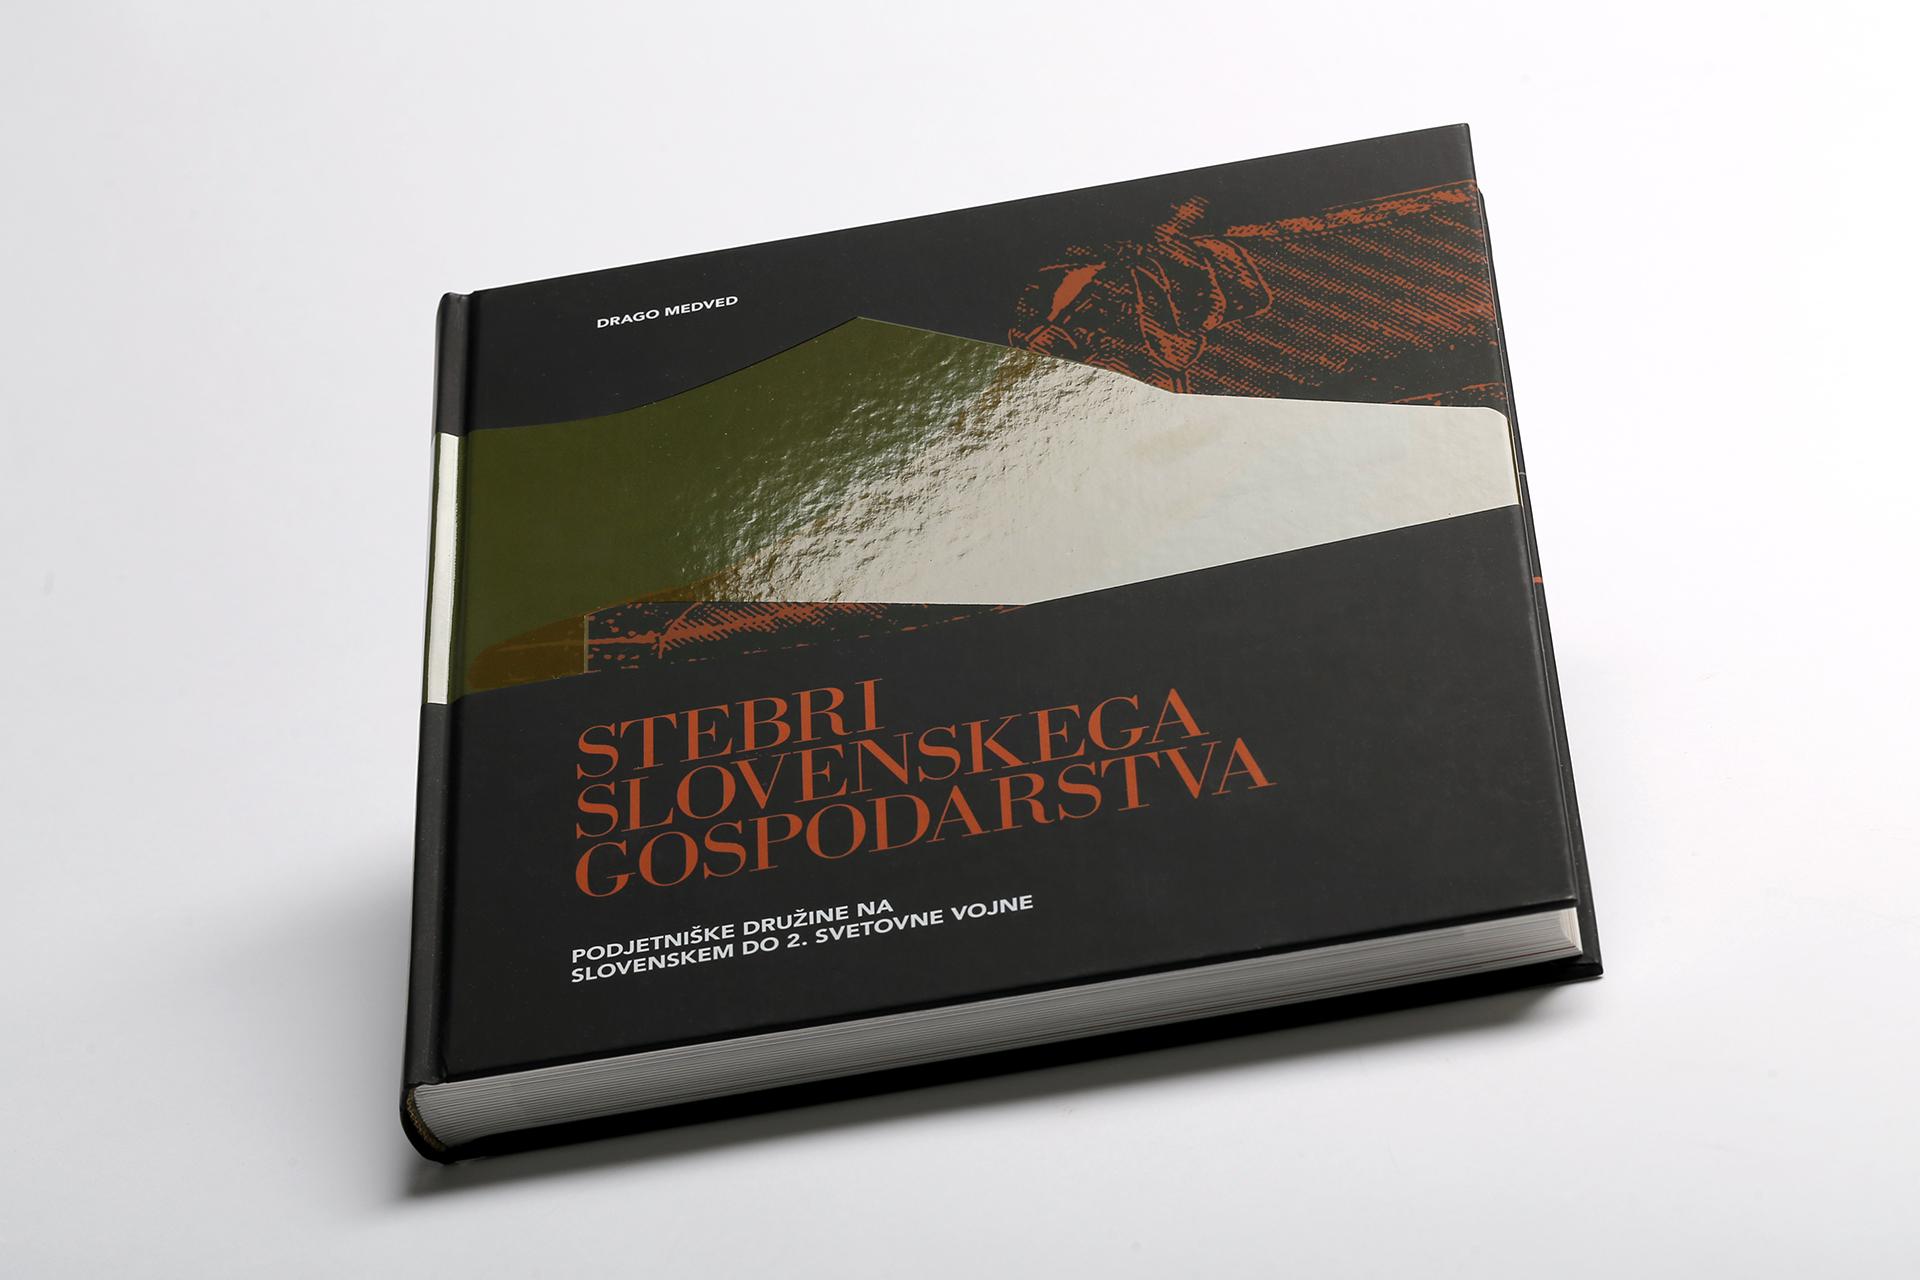 knjiga_stebri_slov_gospodarstva_ma-ma_marko_marinsek_17